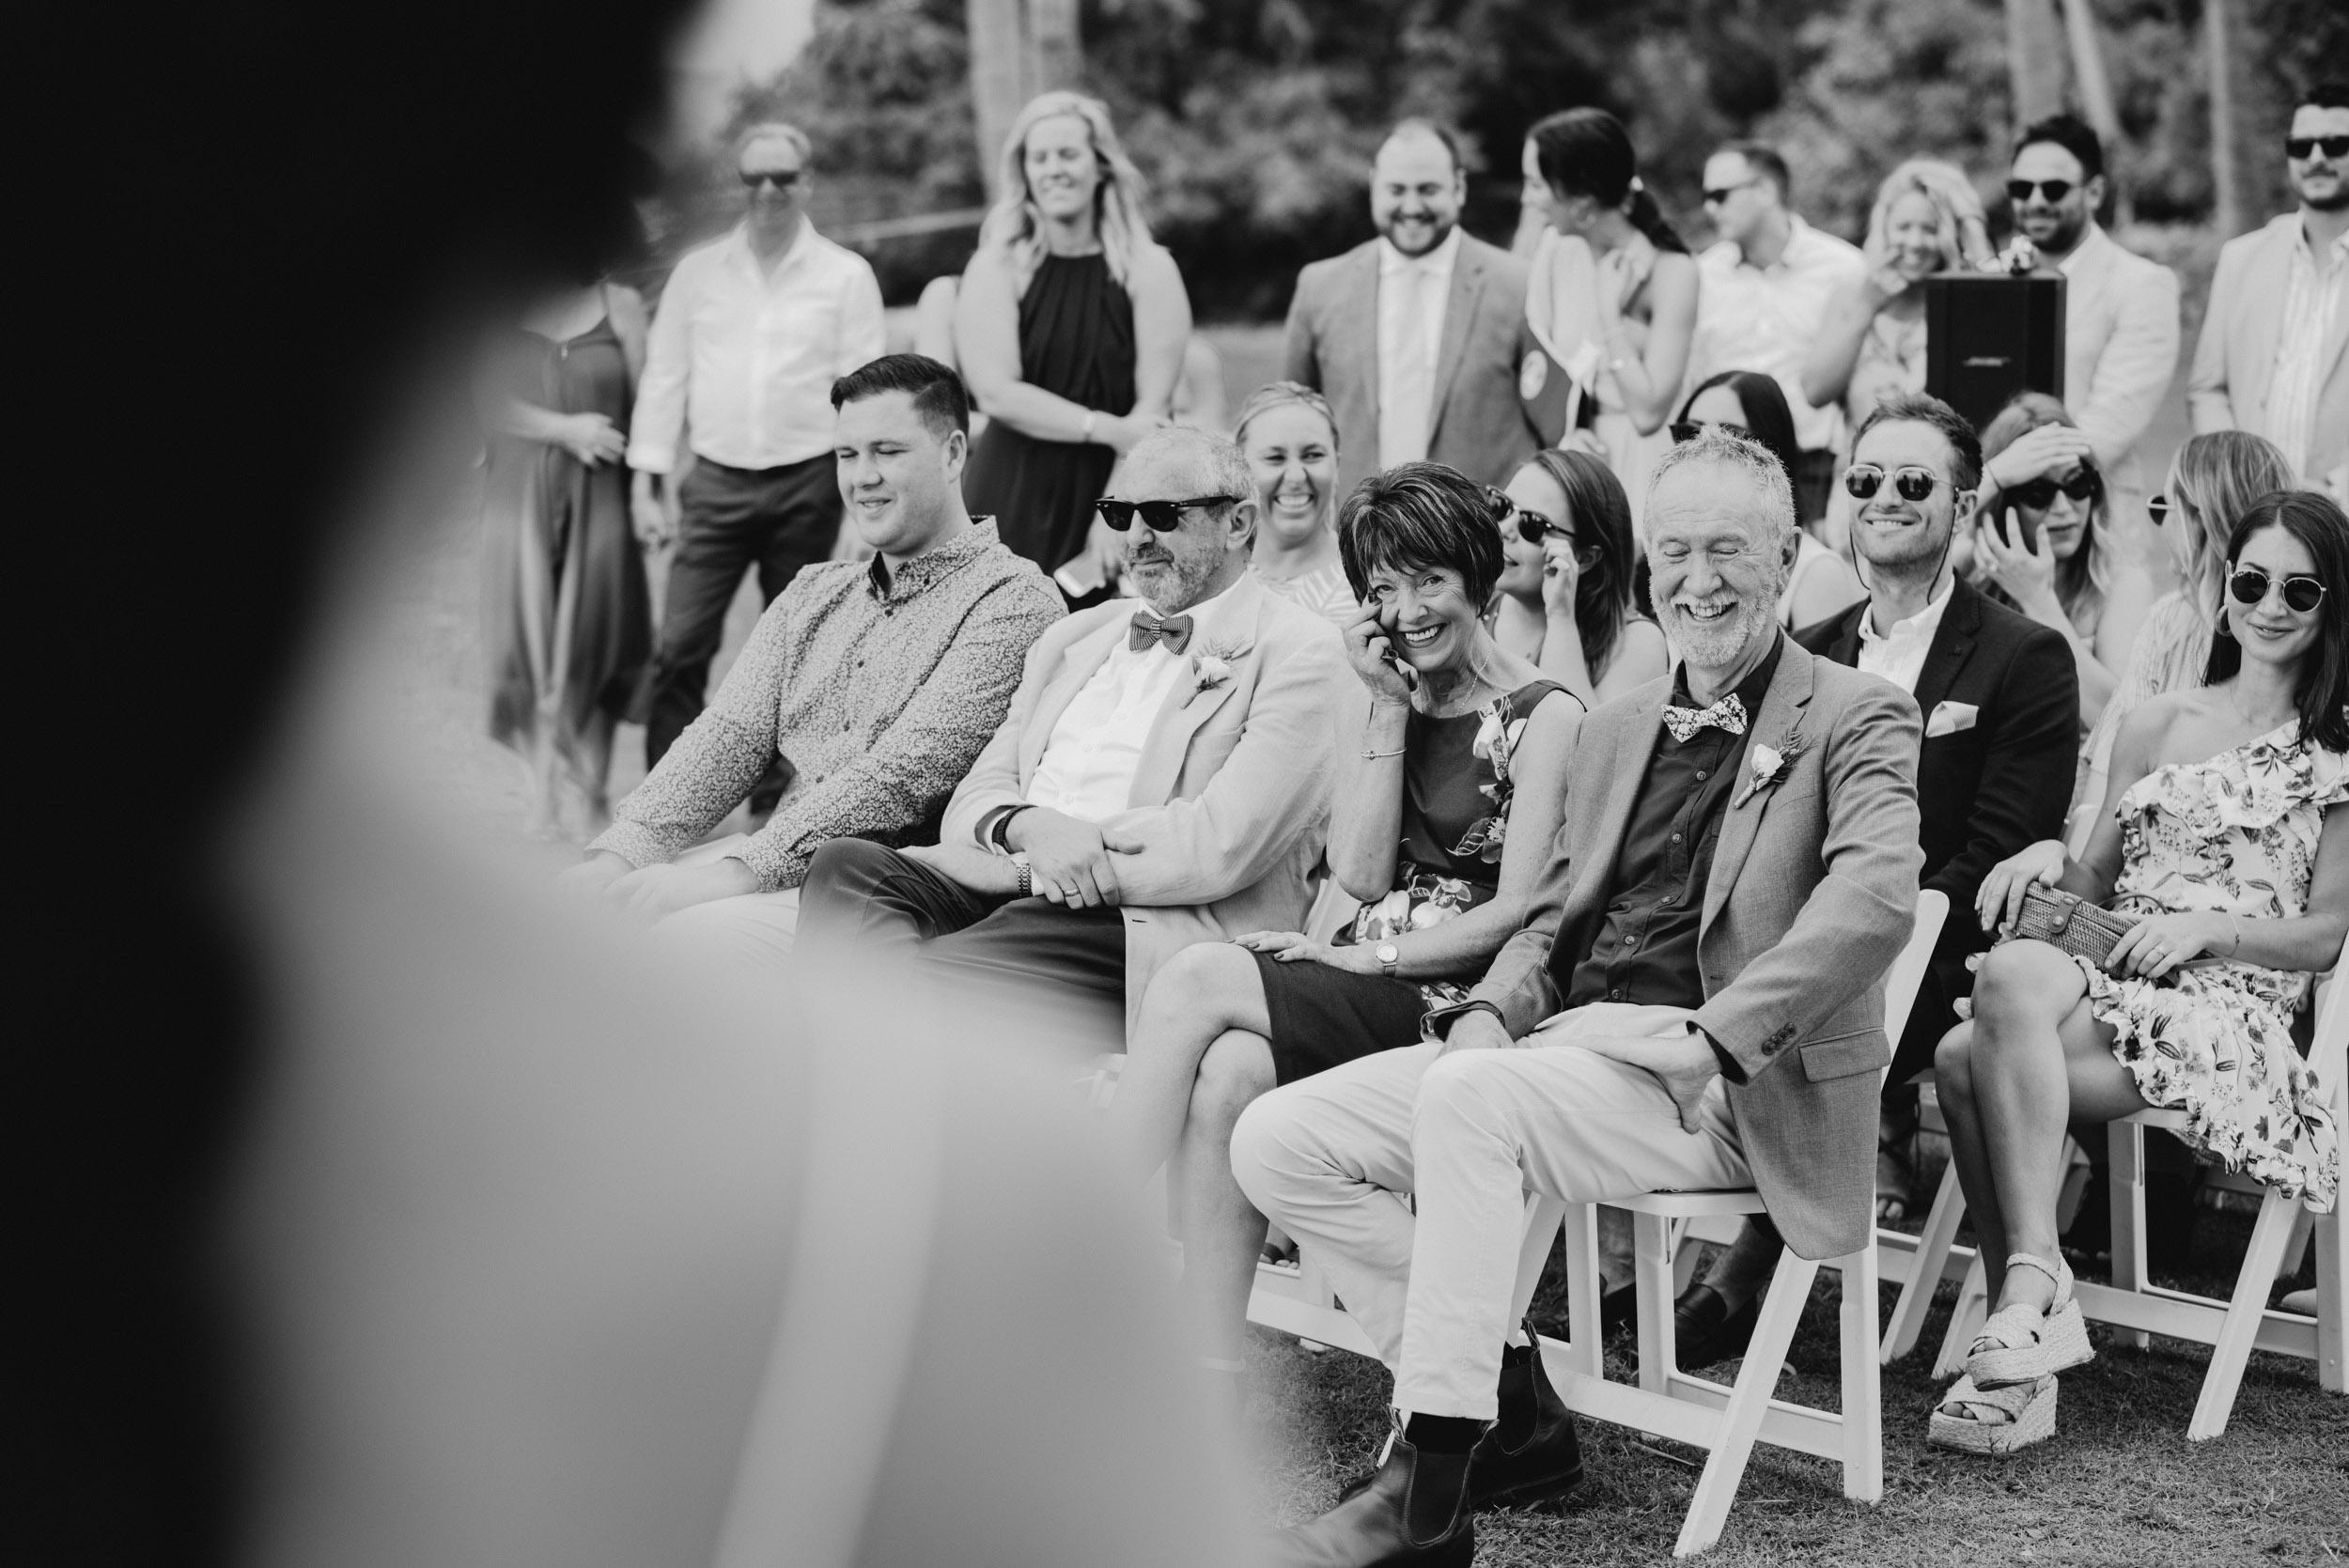 Bridesmaids photos, Bridesmaid dresses, Cairns Wedding Photographer, Port Douglas Wedding Photographer, Queensland Wedding Photographer, Australian Wedding Photographer, Townsville Wedding Photographer, Queensland Wedding Ideas, Port Douglas Wedding Inspiration, Wedding Photography, Unique Wedding Photos, Creative Wedding Photos, Wedding Inspiration, Wedding Ideas, Cairns Elopement Photographer, Places to Elope, Port Douglas Wedding Venues, Cairns Wedding Venues